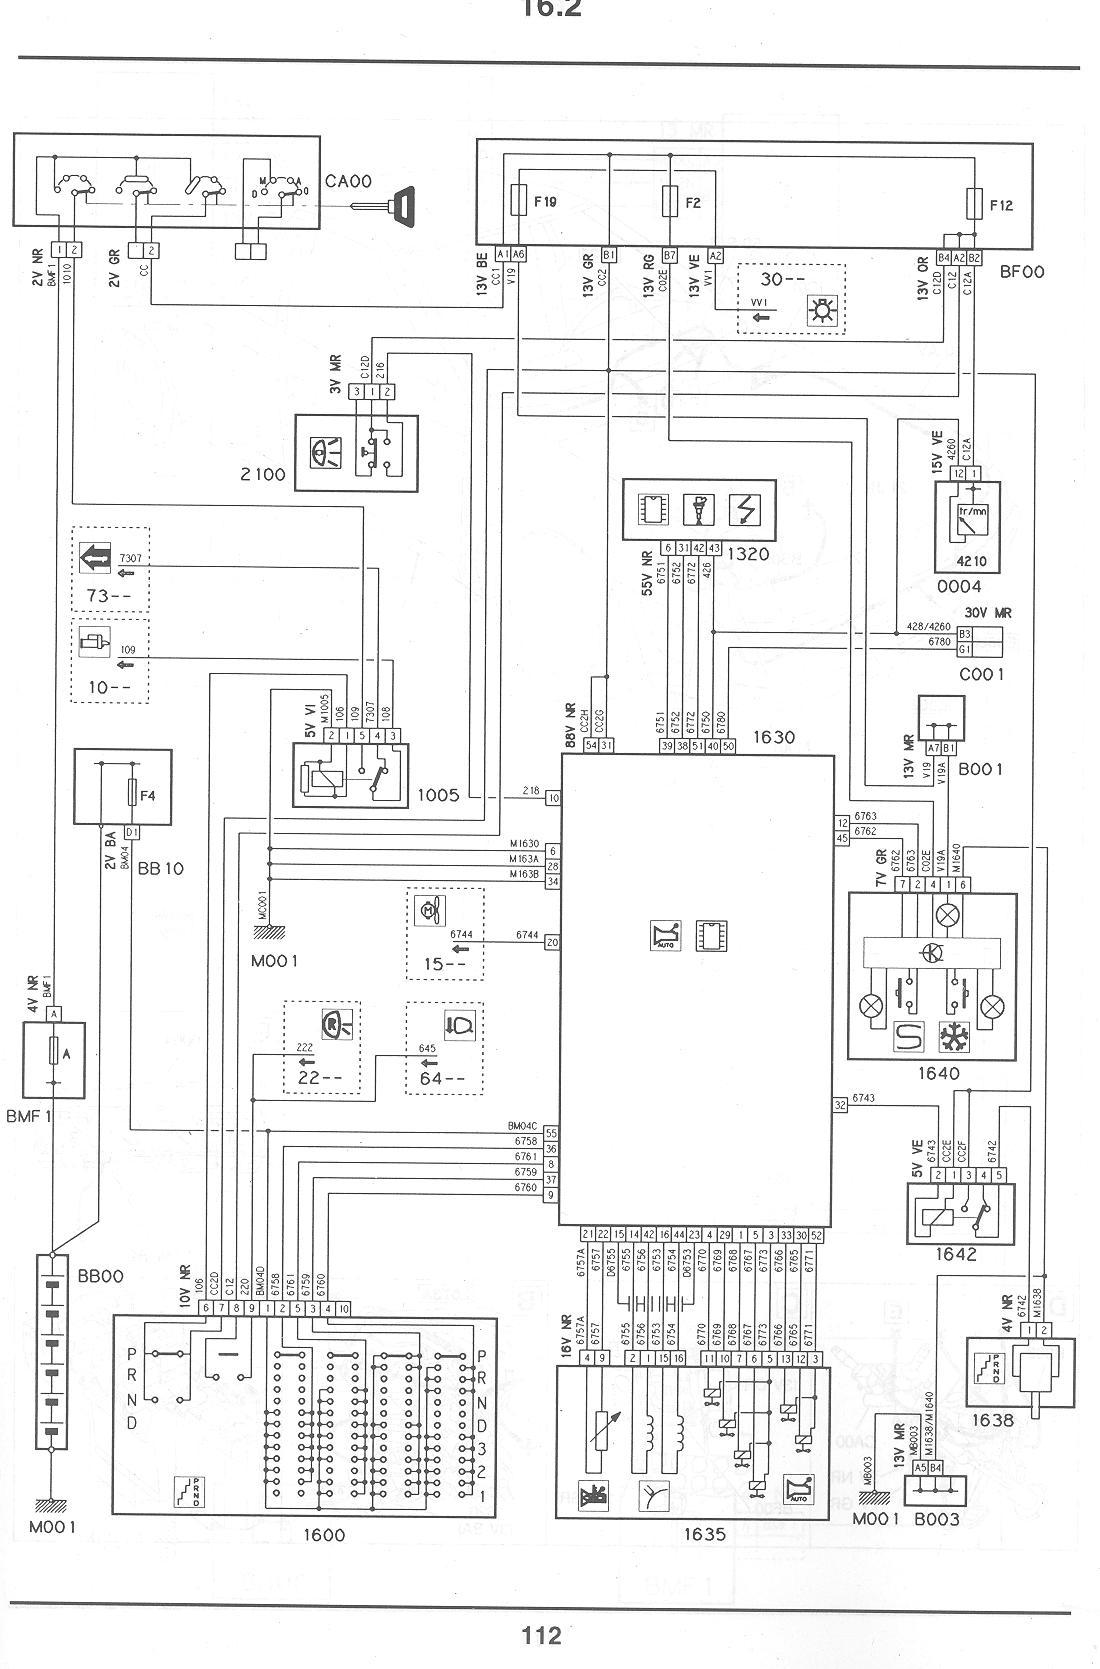 Terrific Citroen Xantia Hdi Wiring Diagram Basic Electronics Wiring Diagram Wiring Digital Resources Antuskbiperorg